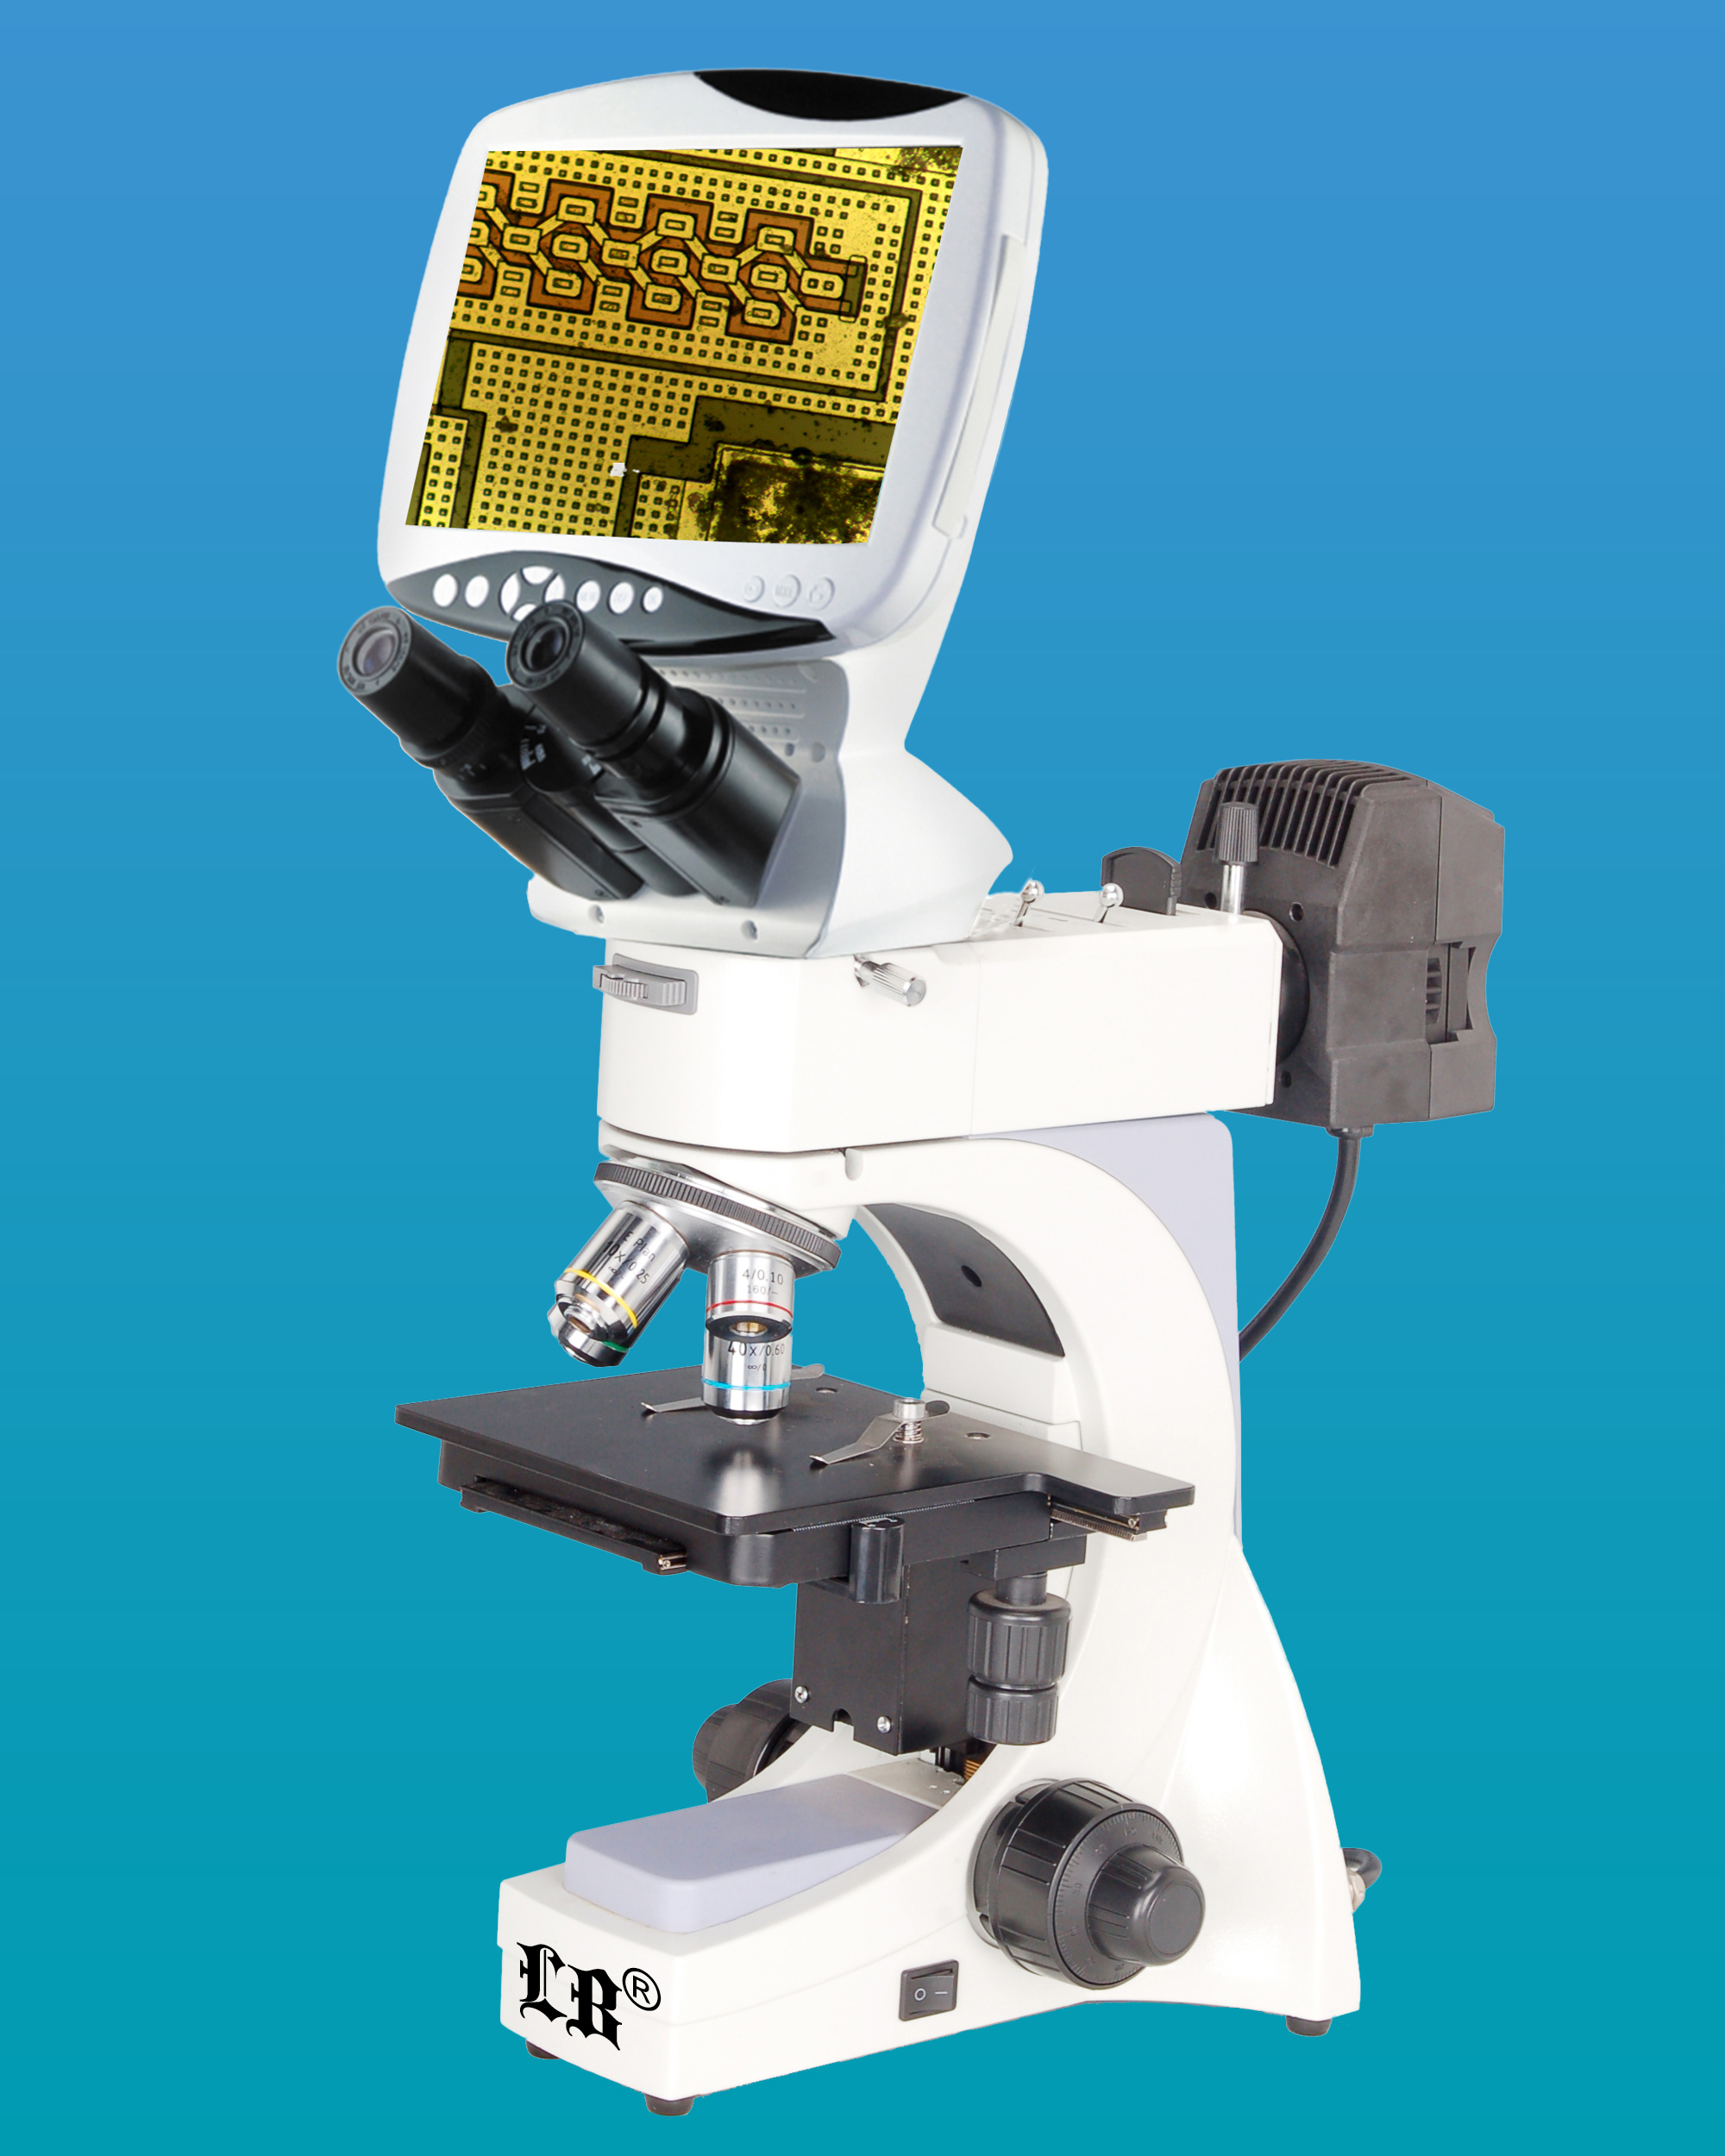 [LB-1600] Compound Digital LCD Metallurgical Microscope w/ 5.0MP Camera